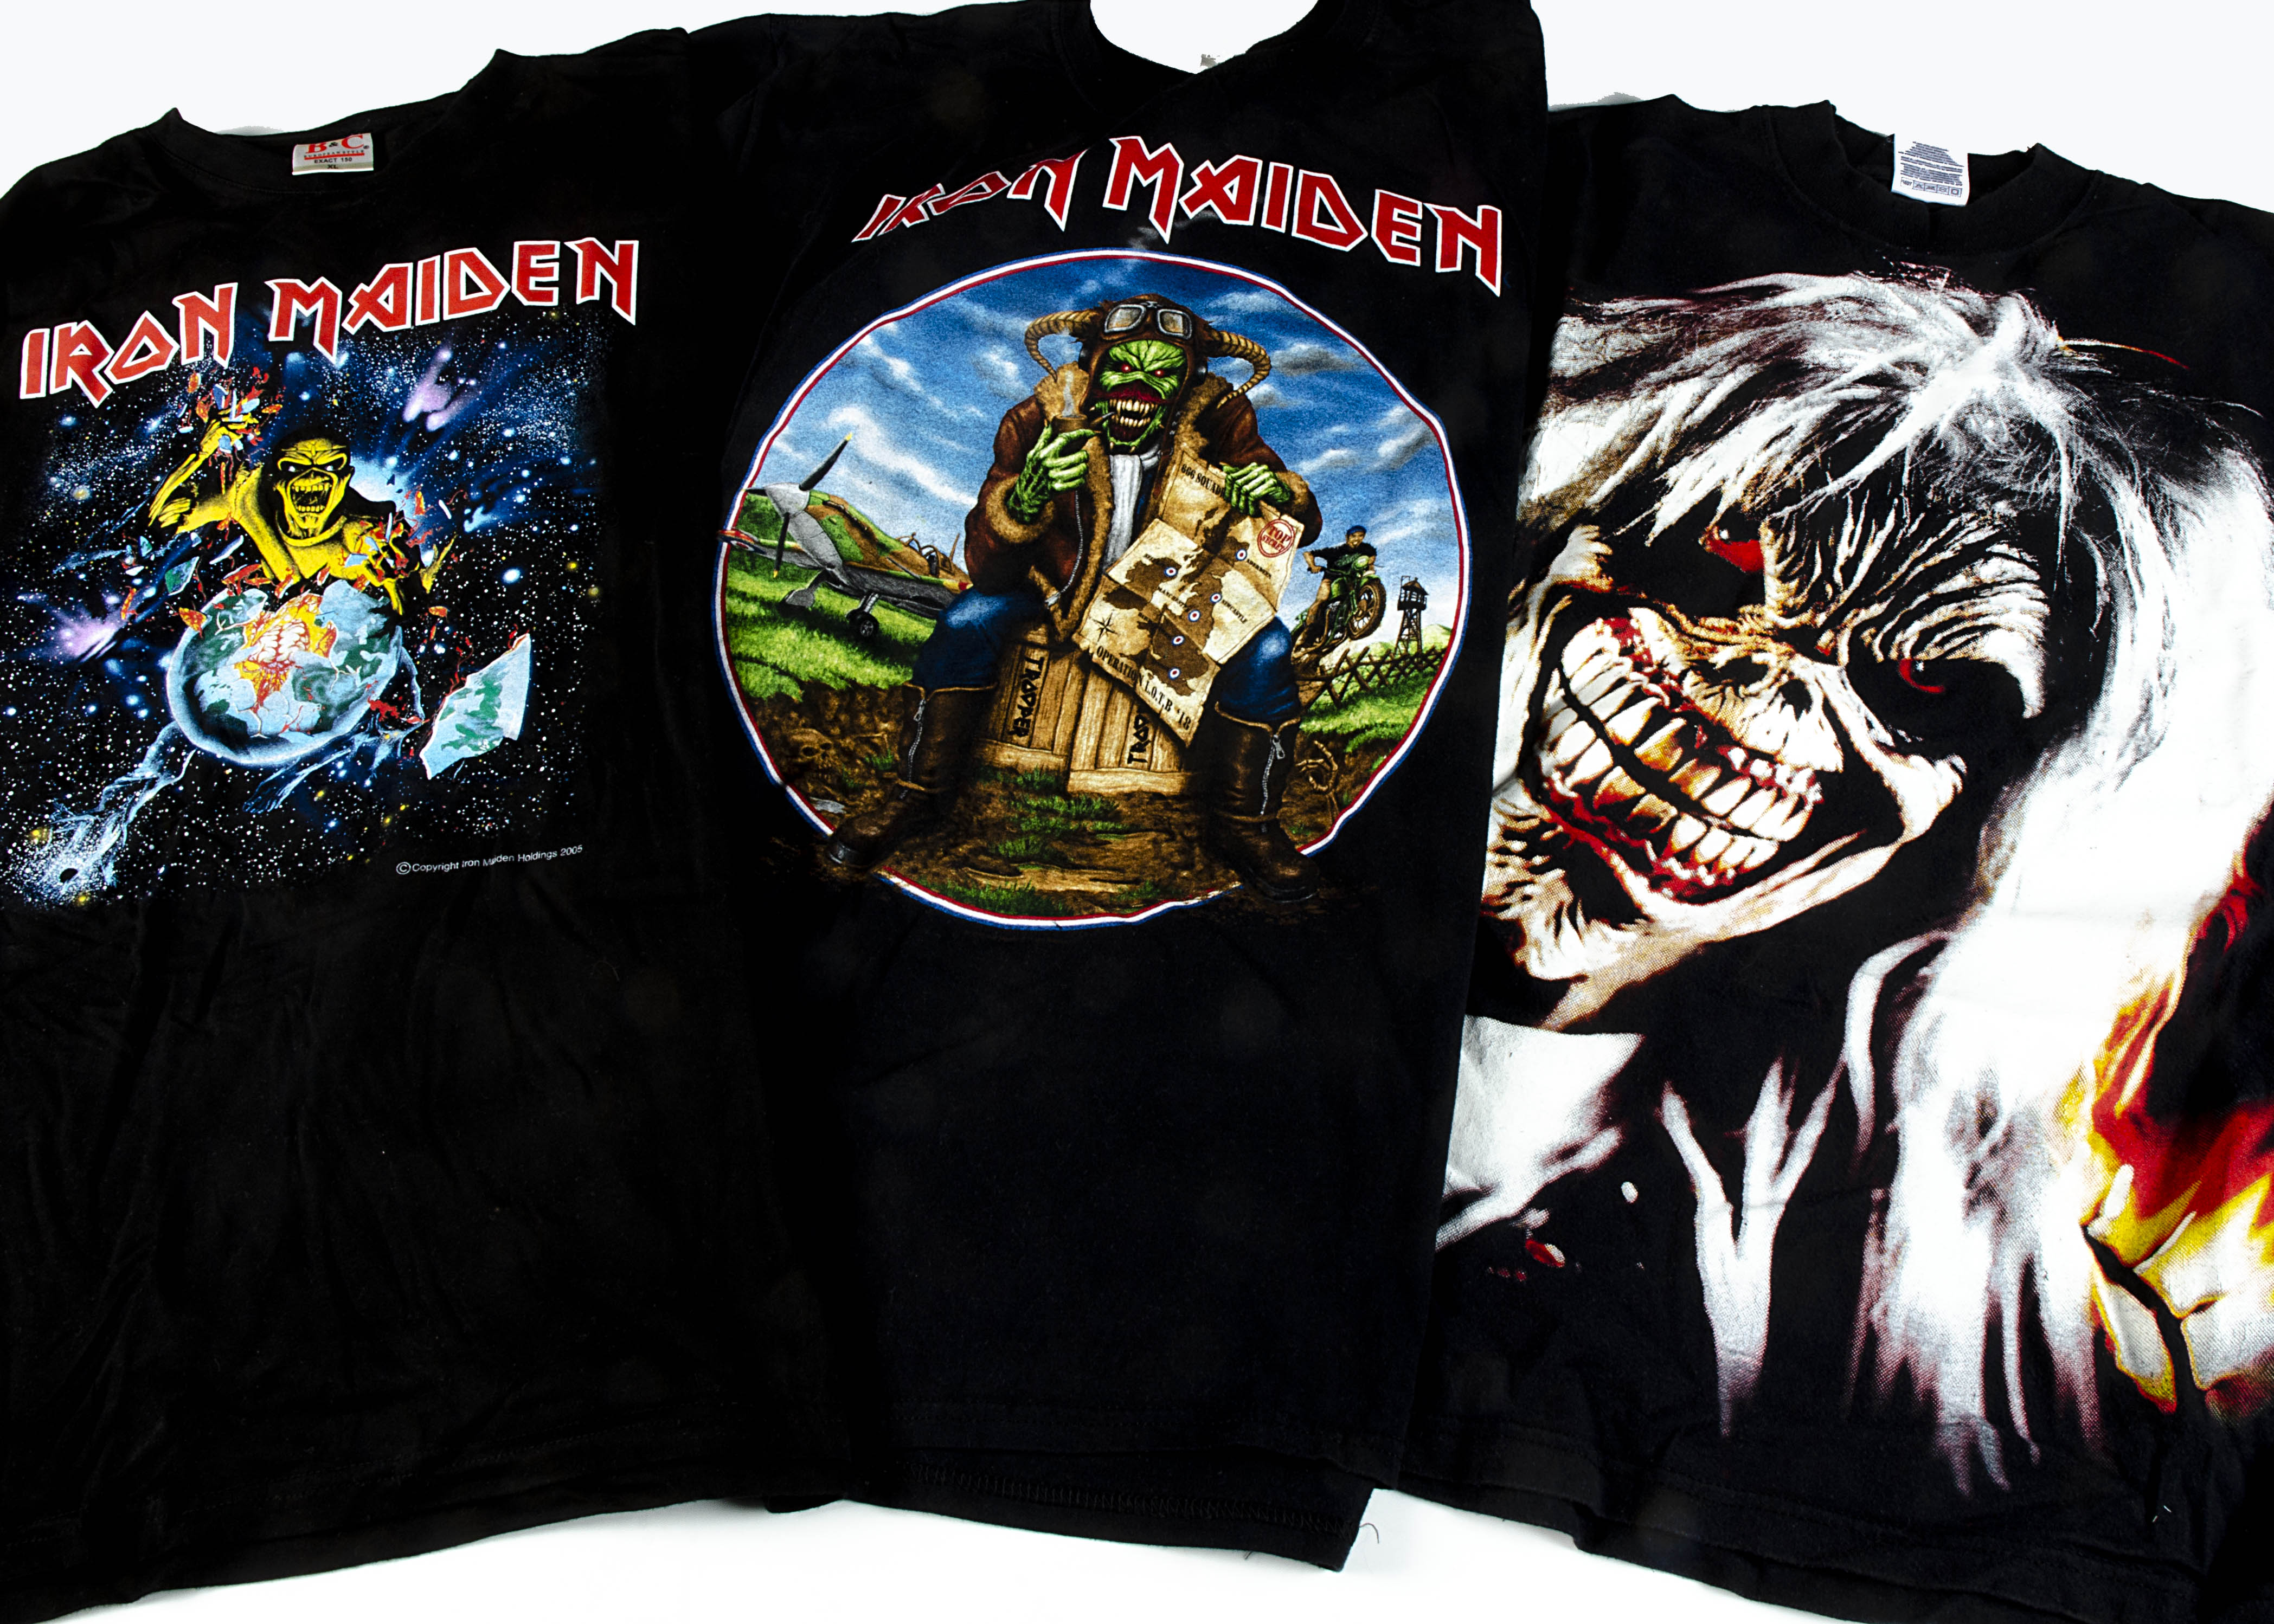 Three Iron Maiden 'T' Shirts, Iron Maiden 'T' shirts - Eddie rips up Europe tour 2005 shirt with